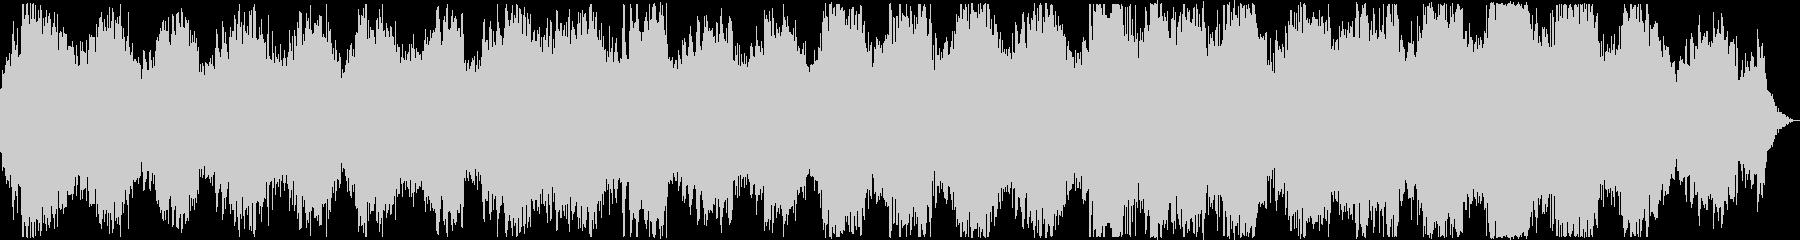 PADS ジャングルオブテンション01の未再生の波形